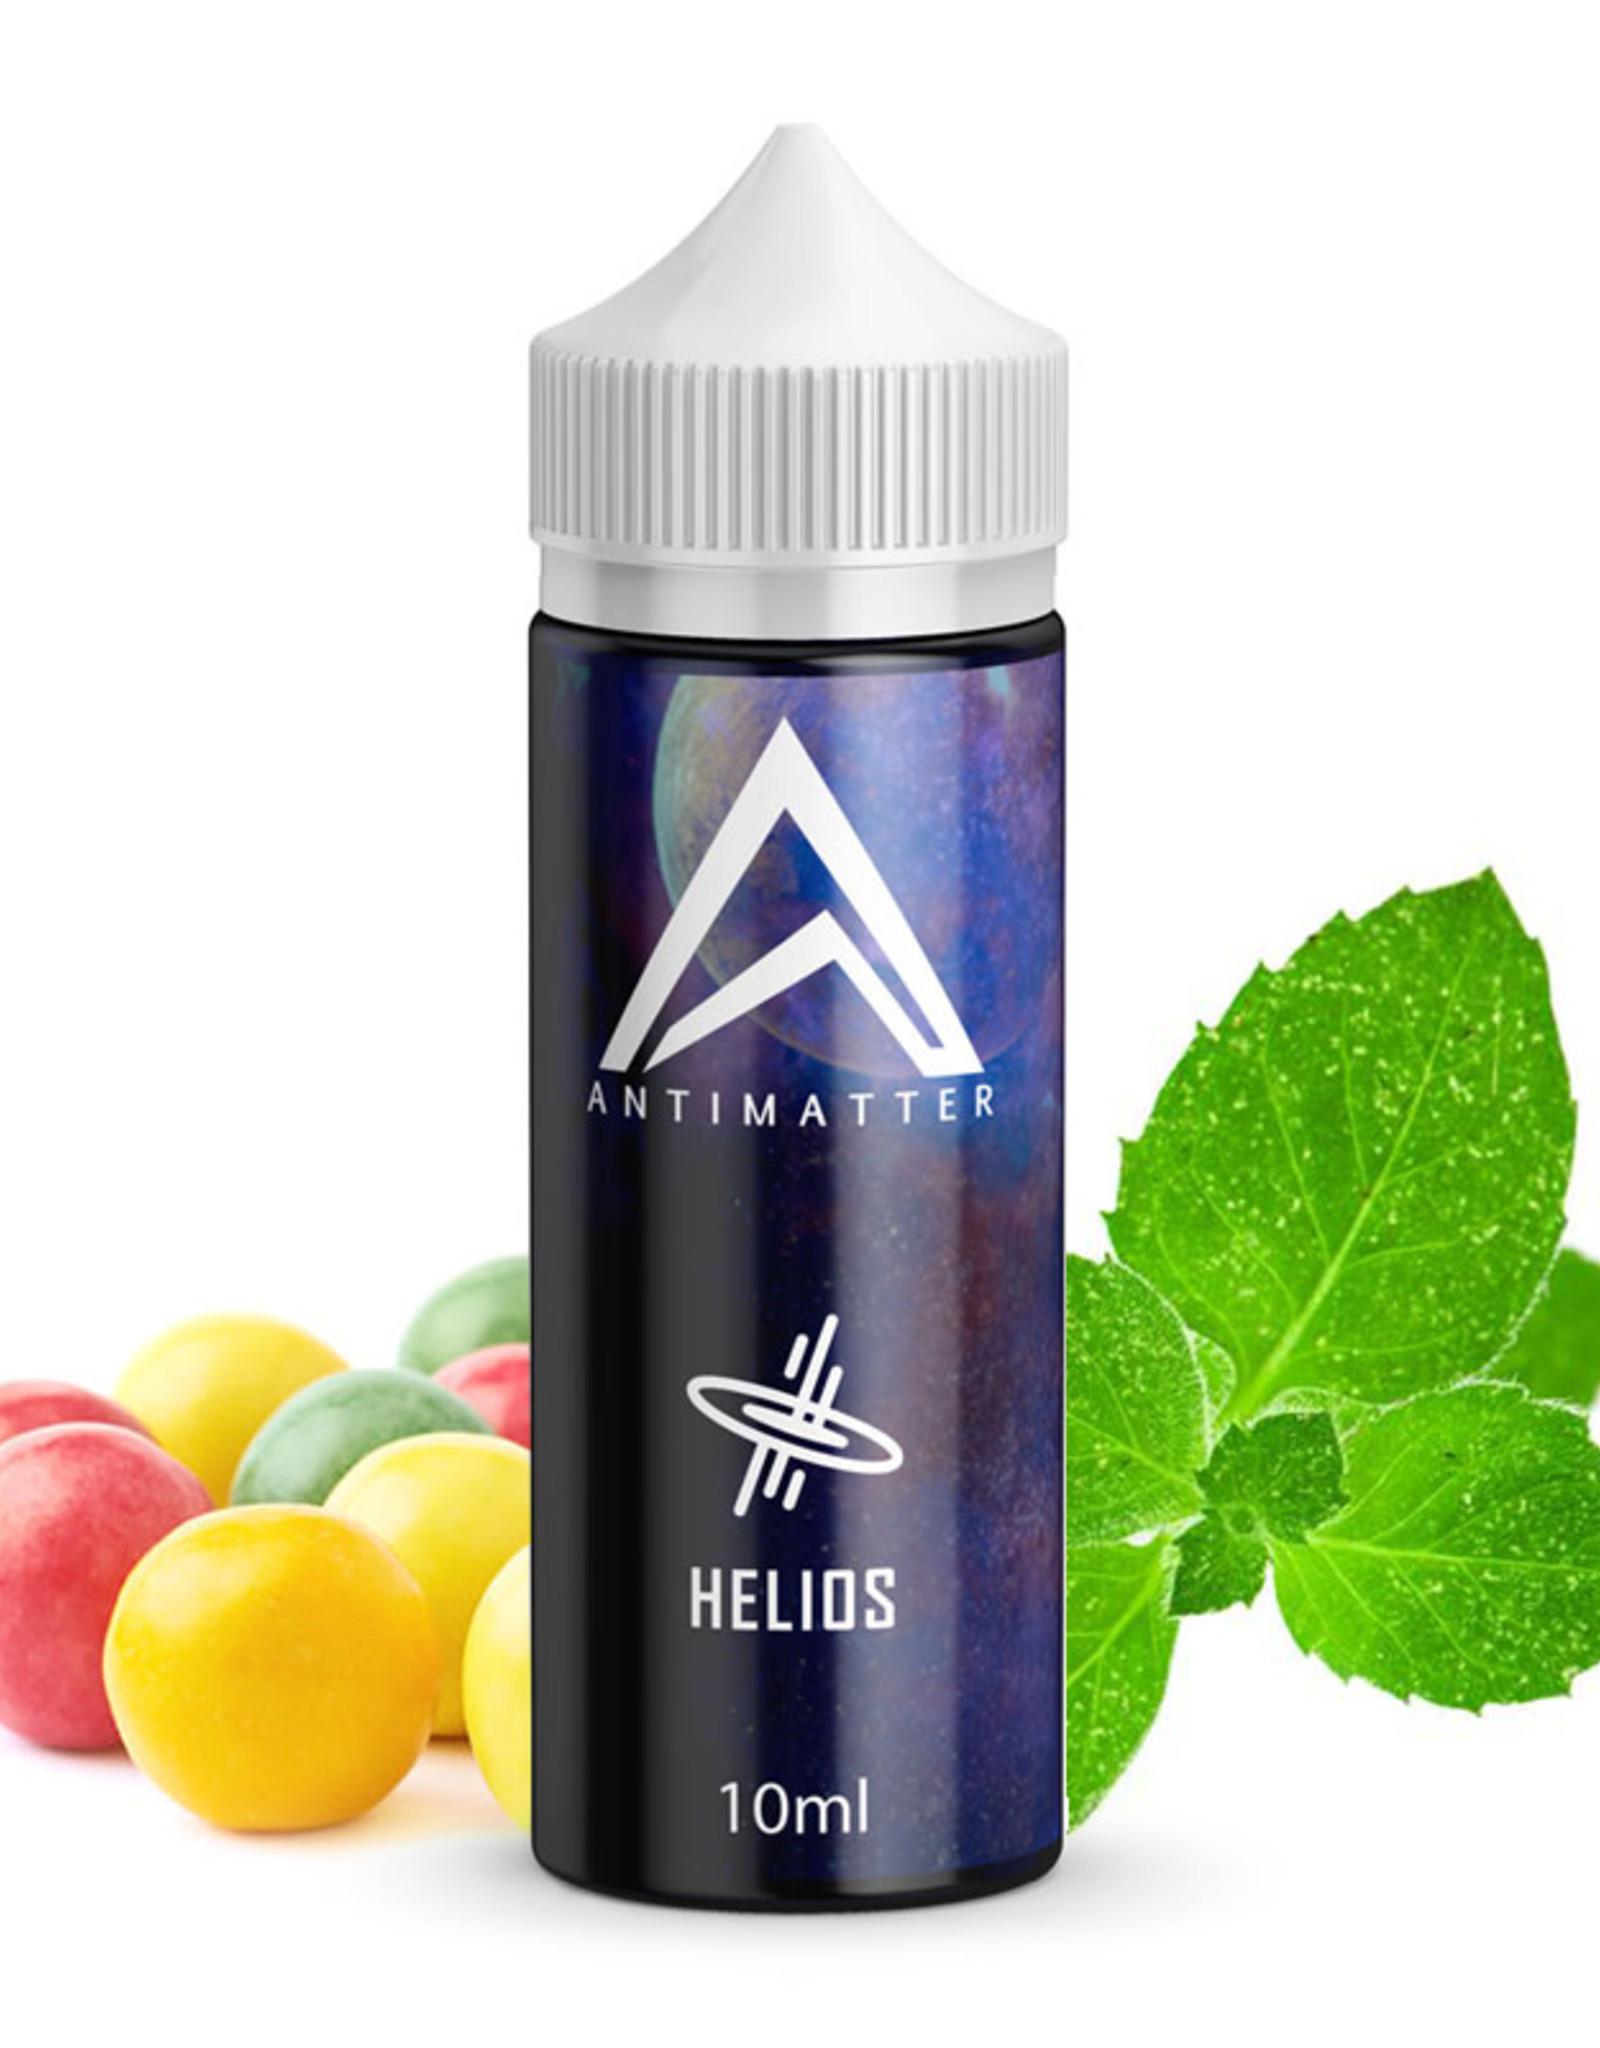 Antimatter Antimatter - Helios 10ml